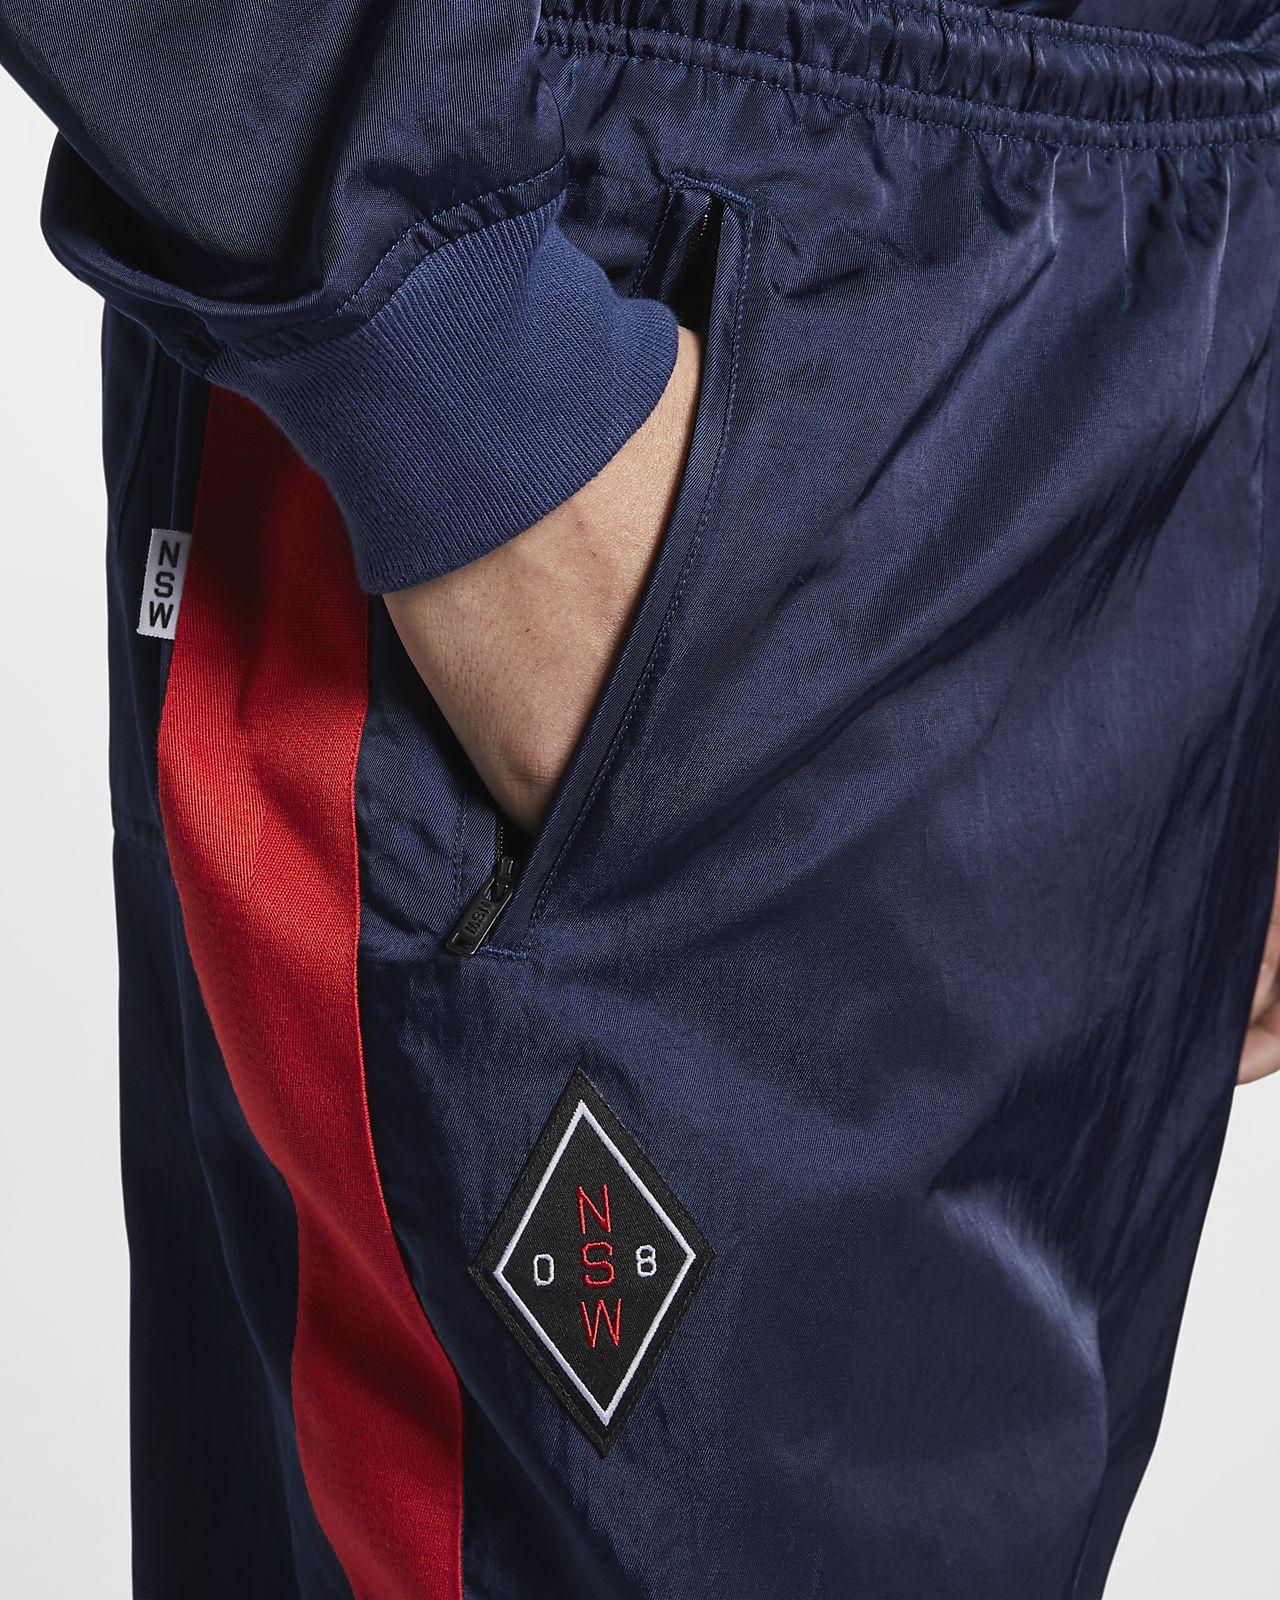 dc5cb7c5c580f Nike Sportswear NSW Men s Woven Pants. Nike.com